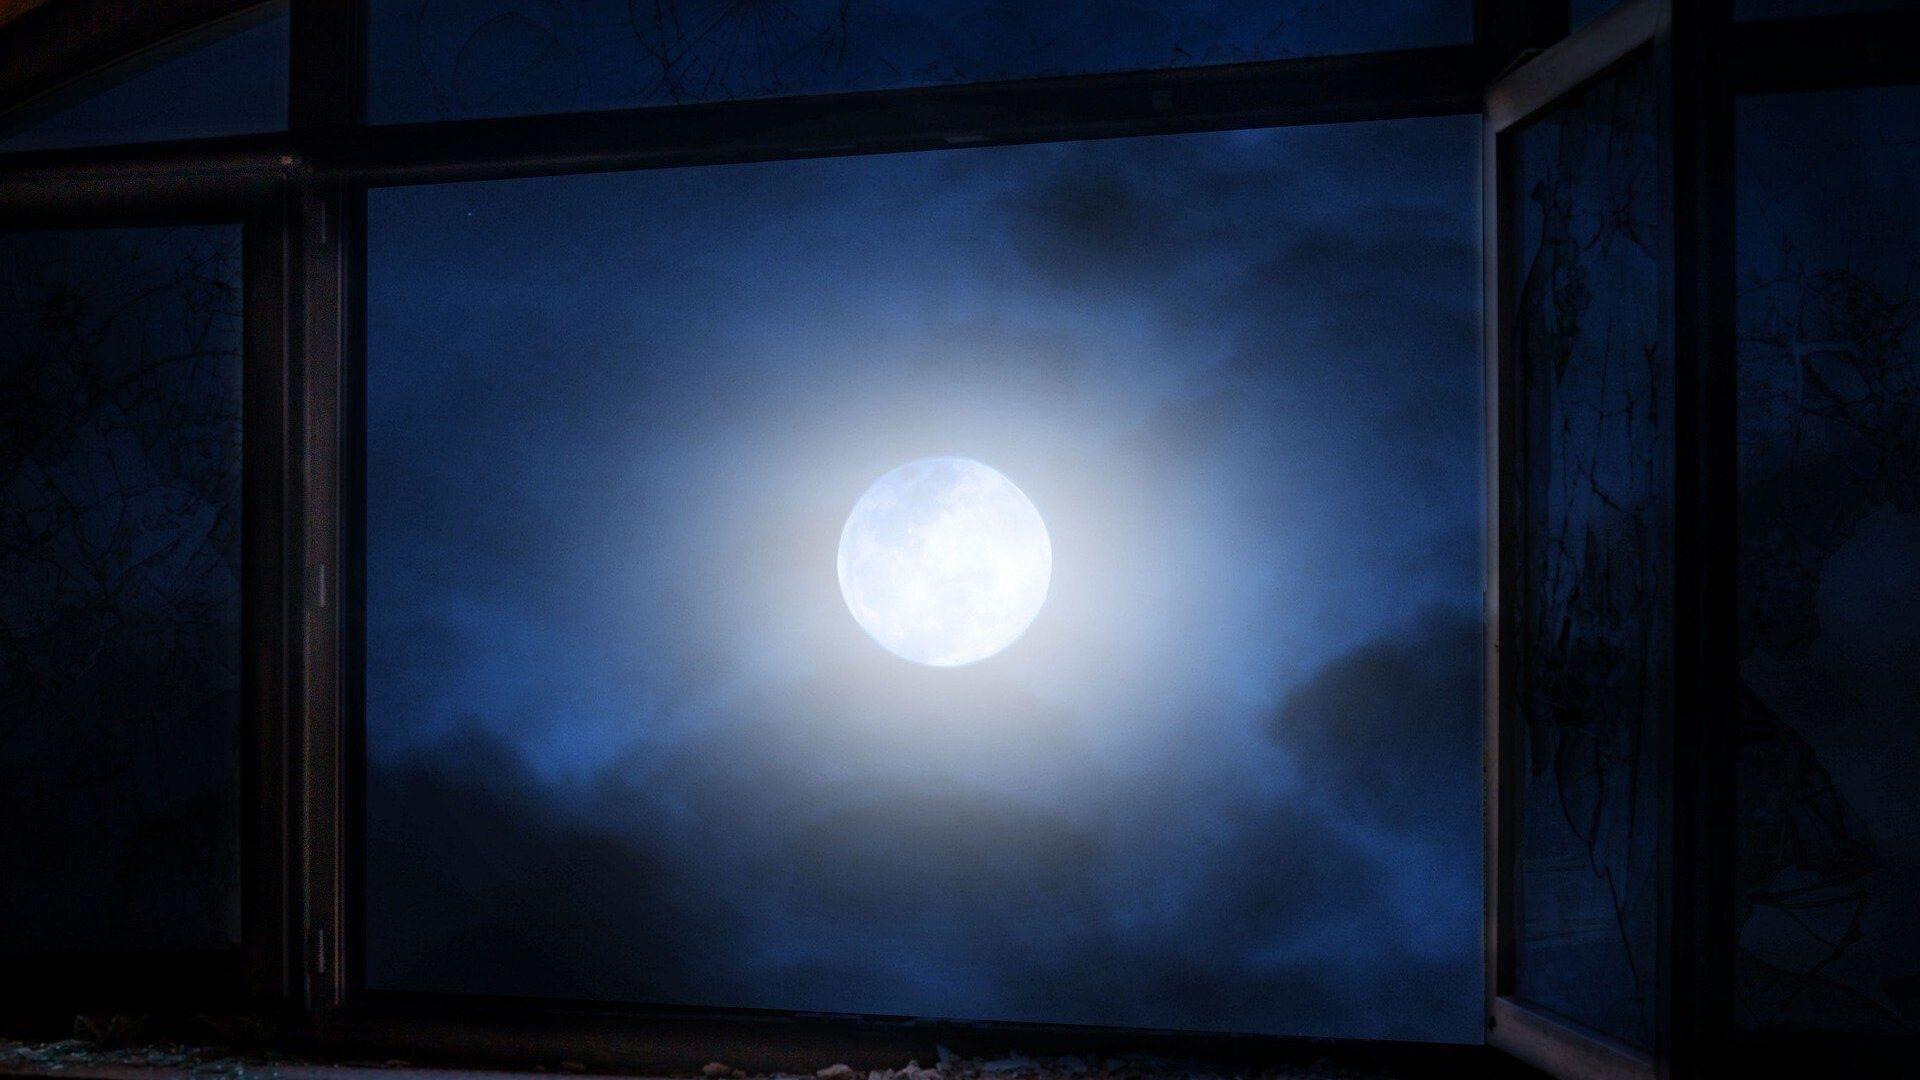 Luna llena - Sputnik Mundo, 1920, 23.07.2021